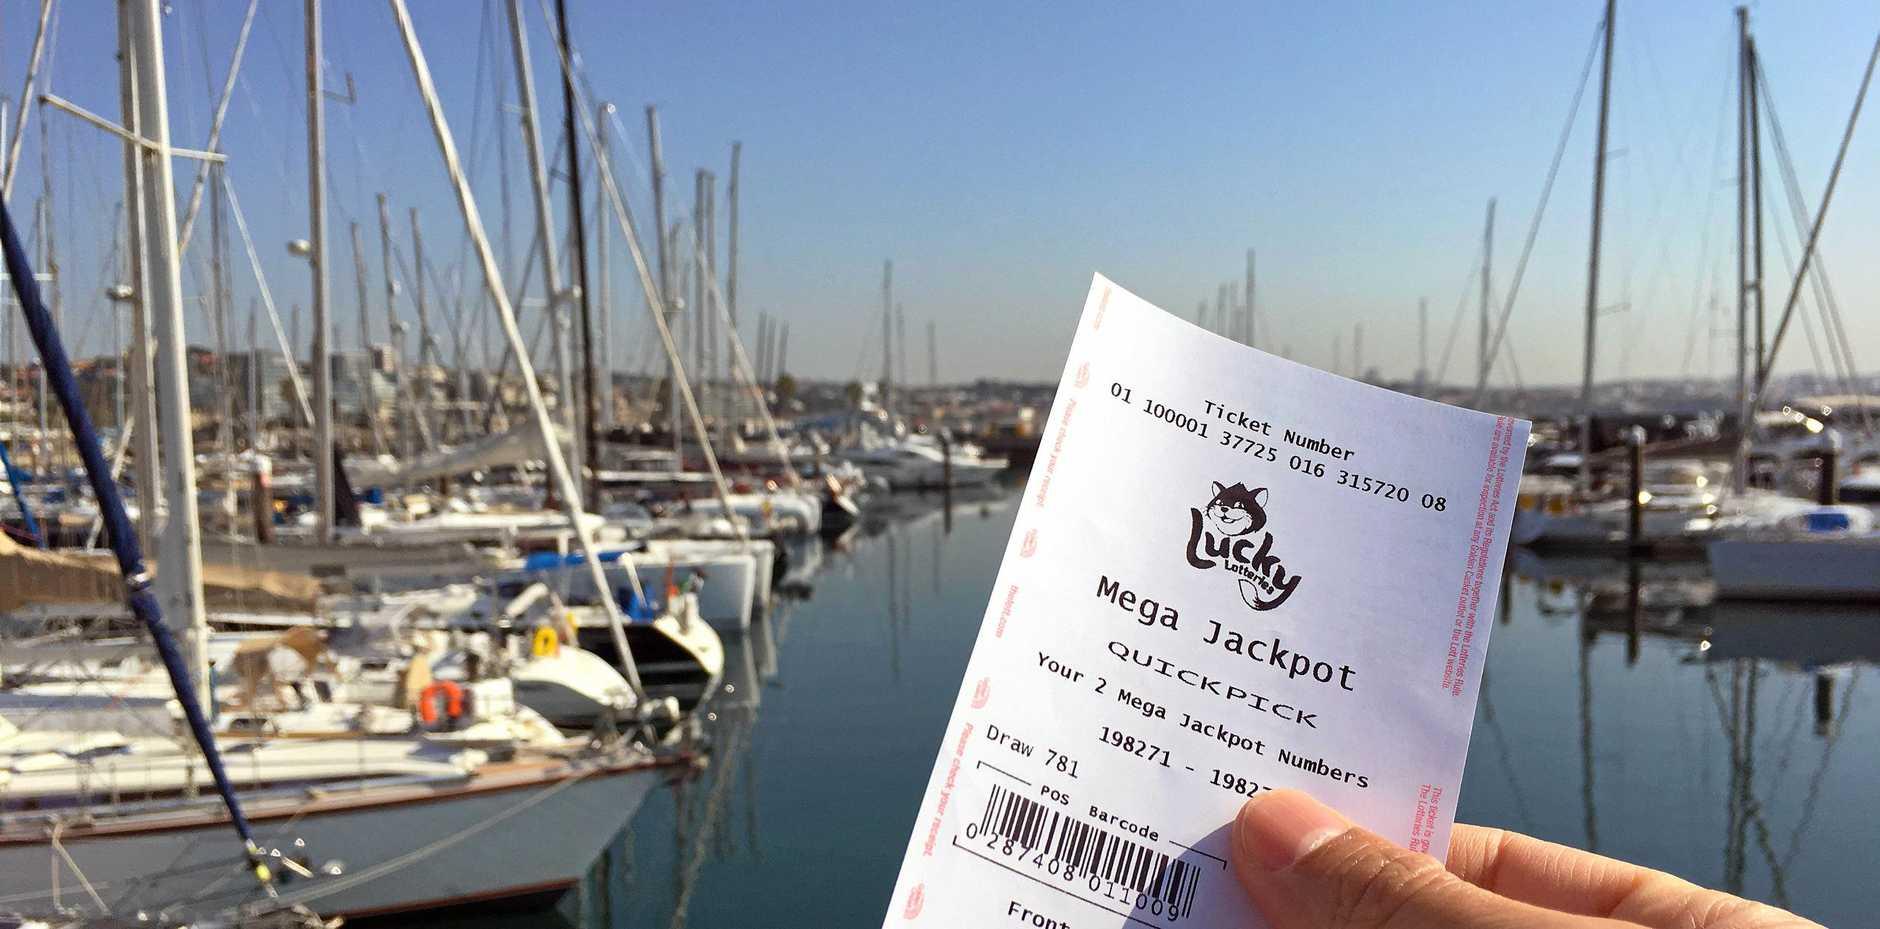 Lotto win, winning ticket, NSW Lotto, generic lottery ticket win.